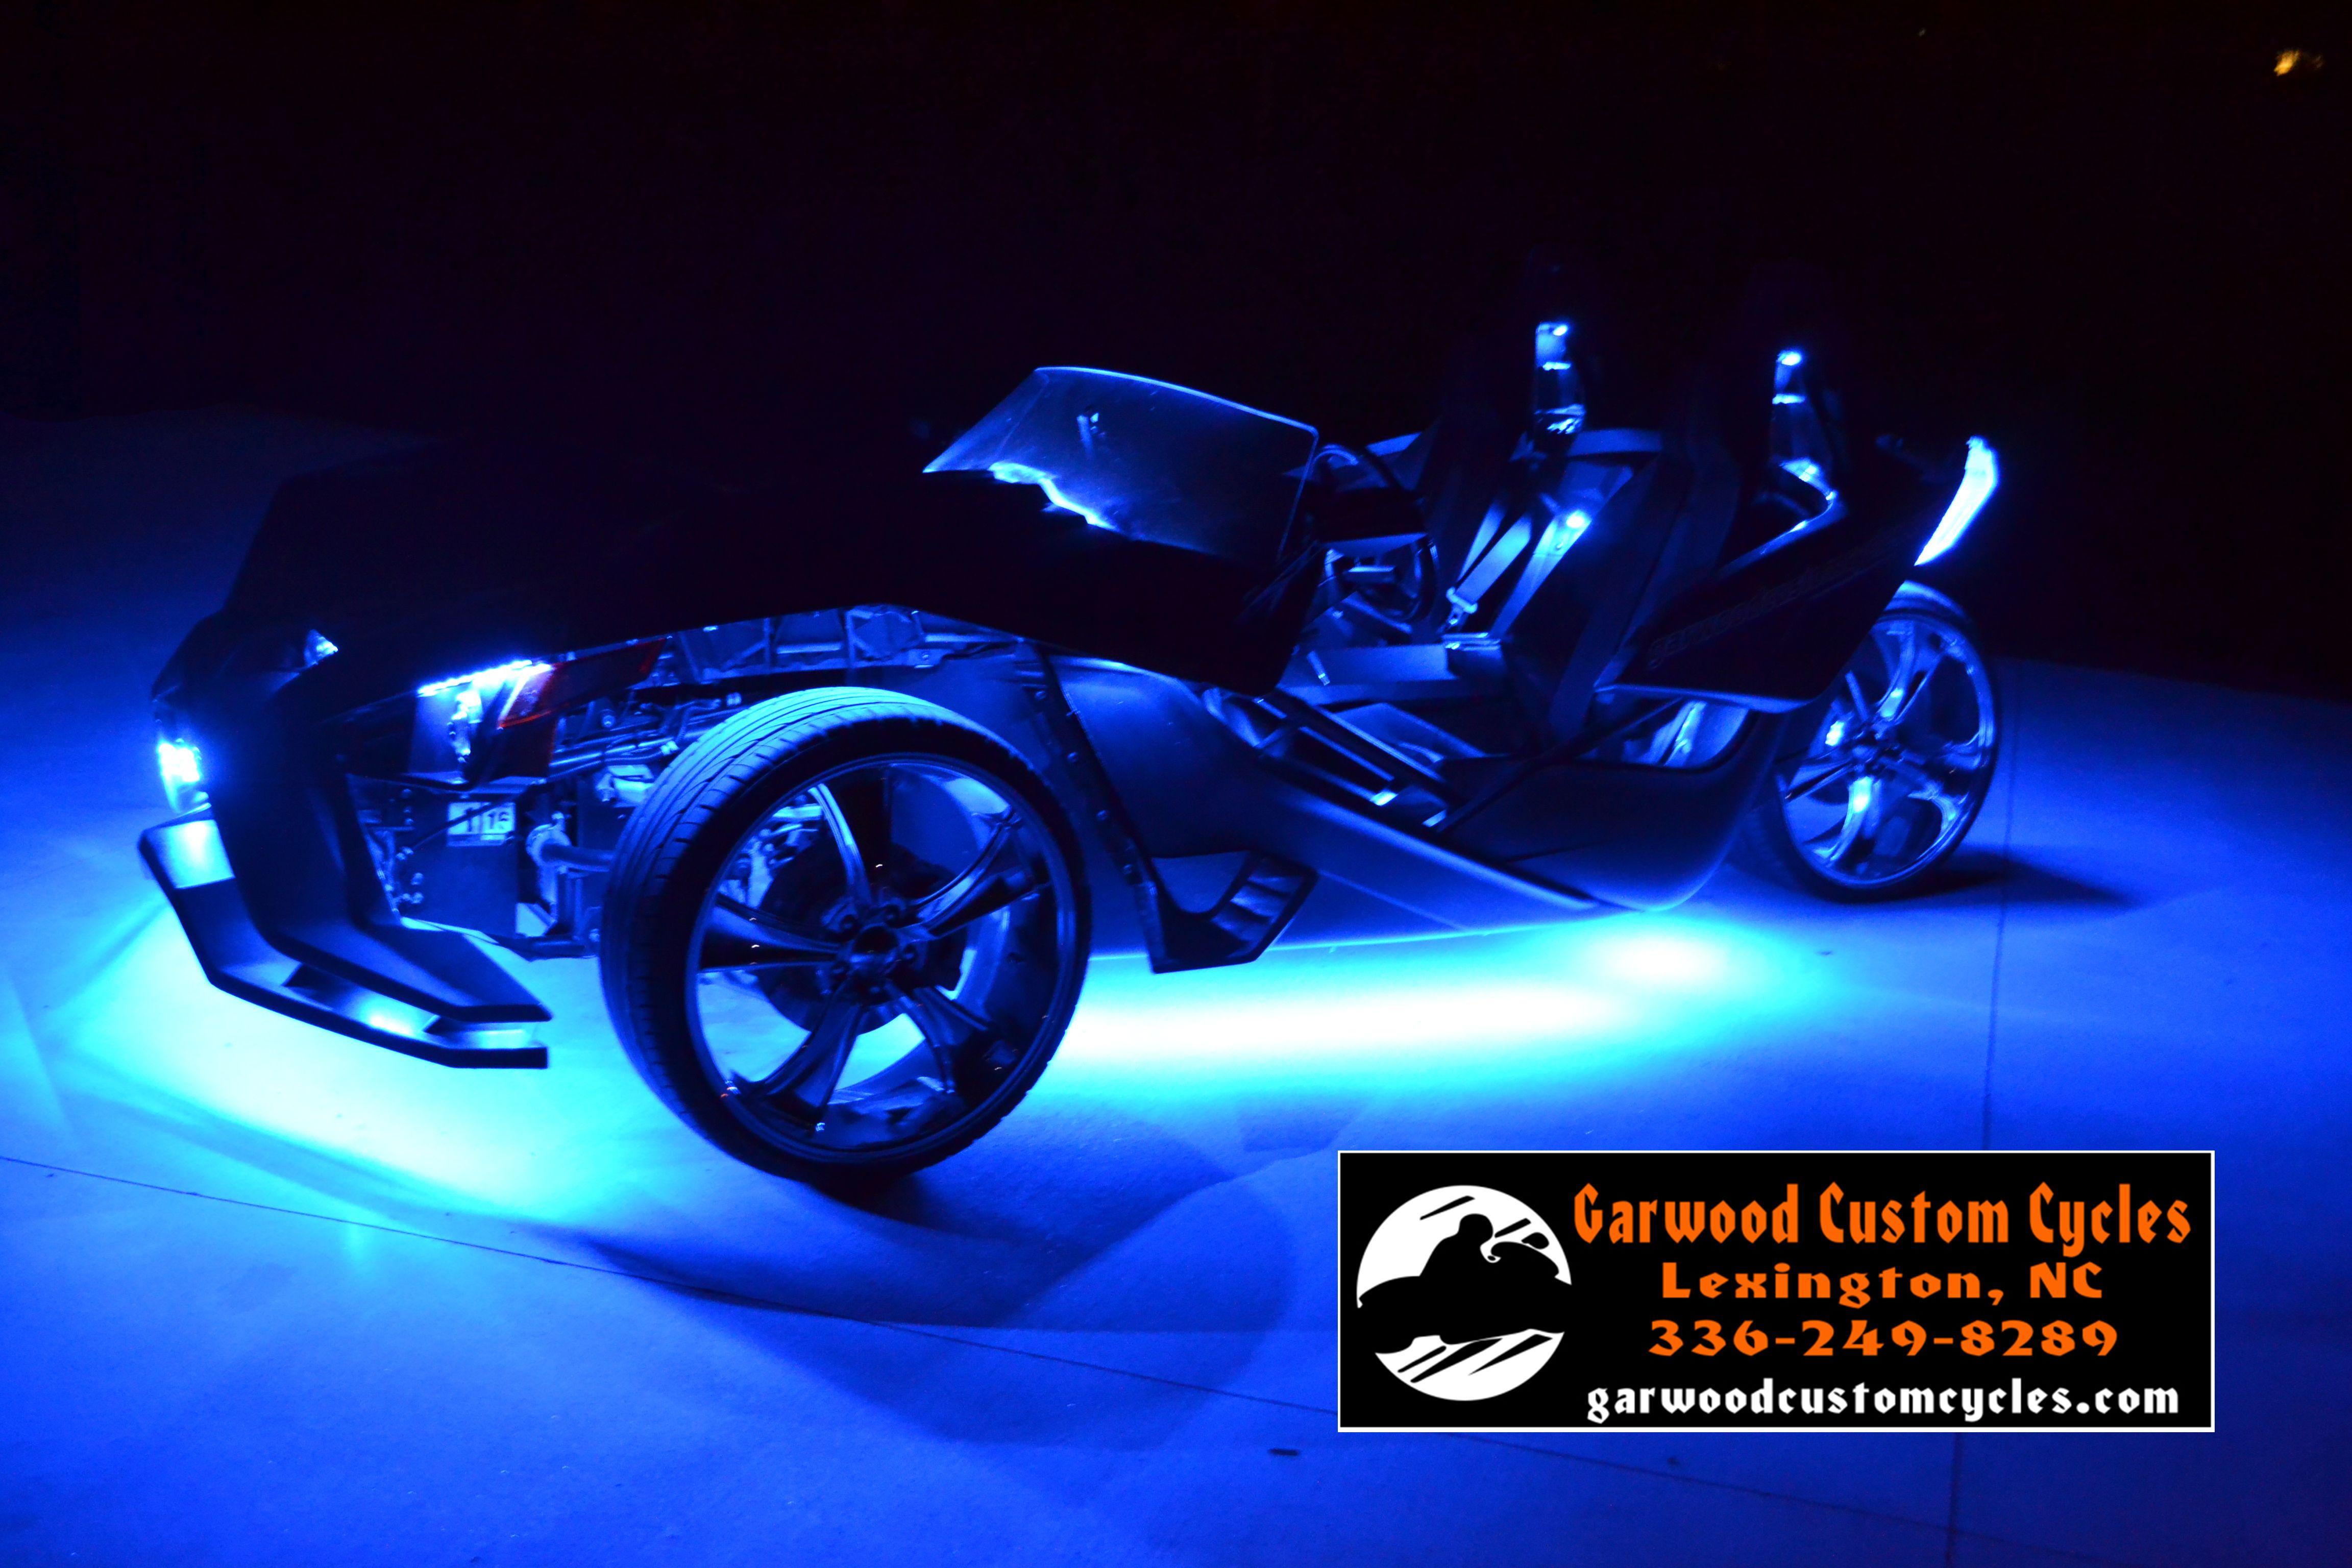 Slingshot Polaris Lightkit Garwood Custom Cycles Offers Ultra Bright Light Kits For Most All Brand Mo Polaris Slingshot Custom Cycles Custom Motorcycle Shop